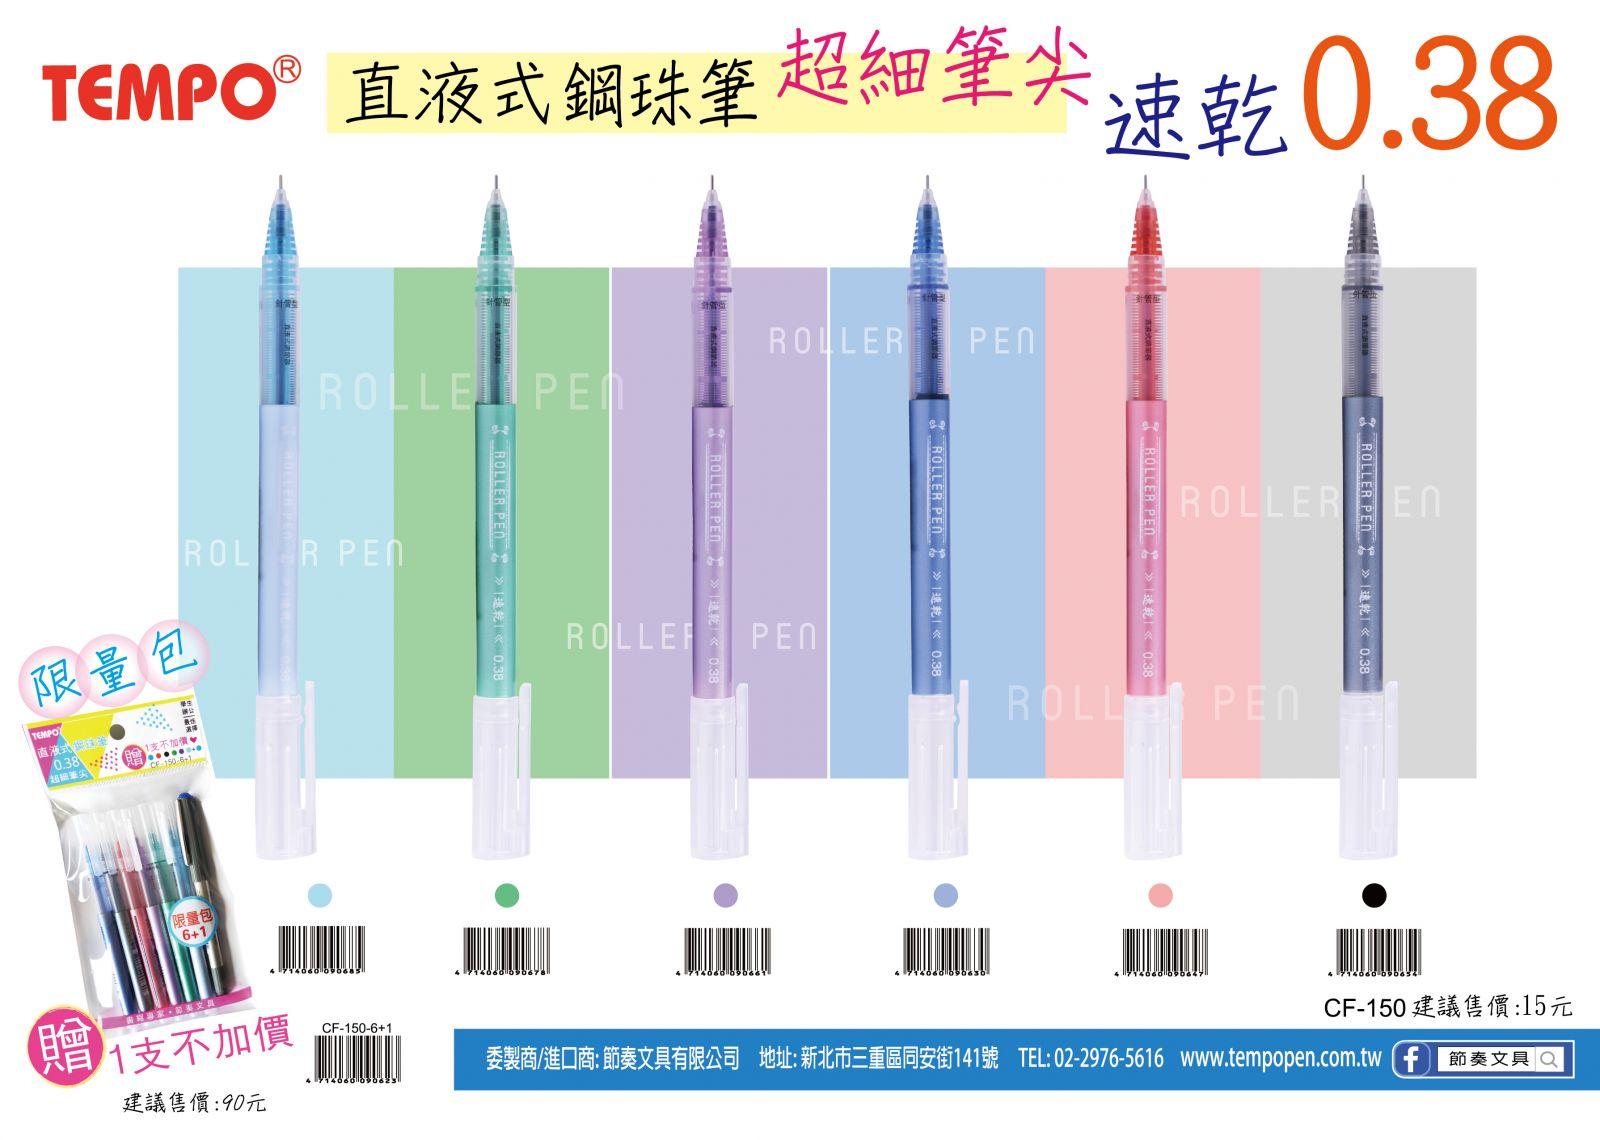 TEMPO 節奏 CF-150 0.38直液式鋼珠筆 0.38mm [速乾 / 細字 鋼珠筆]